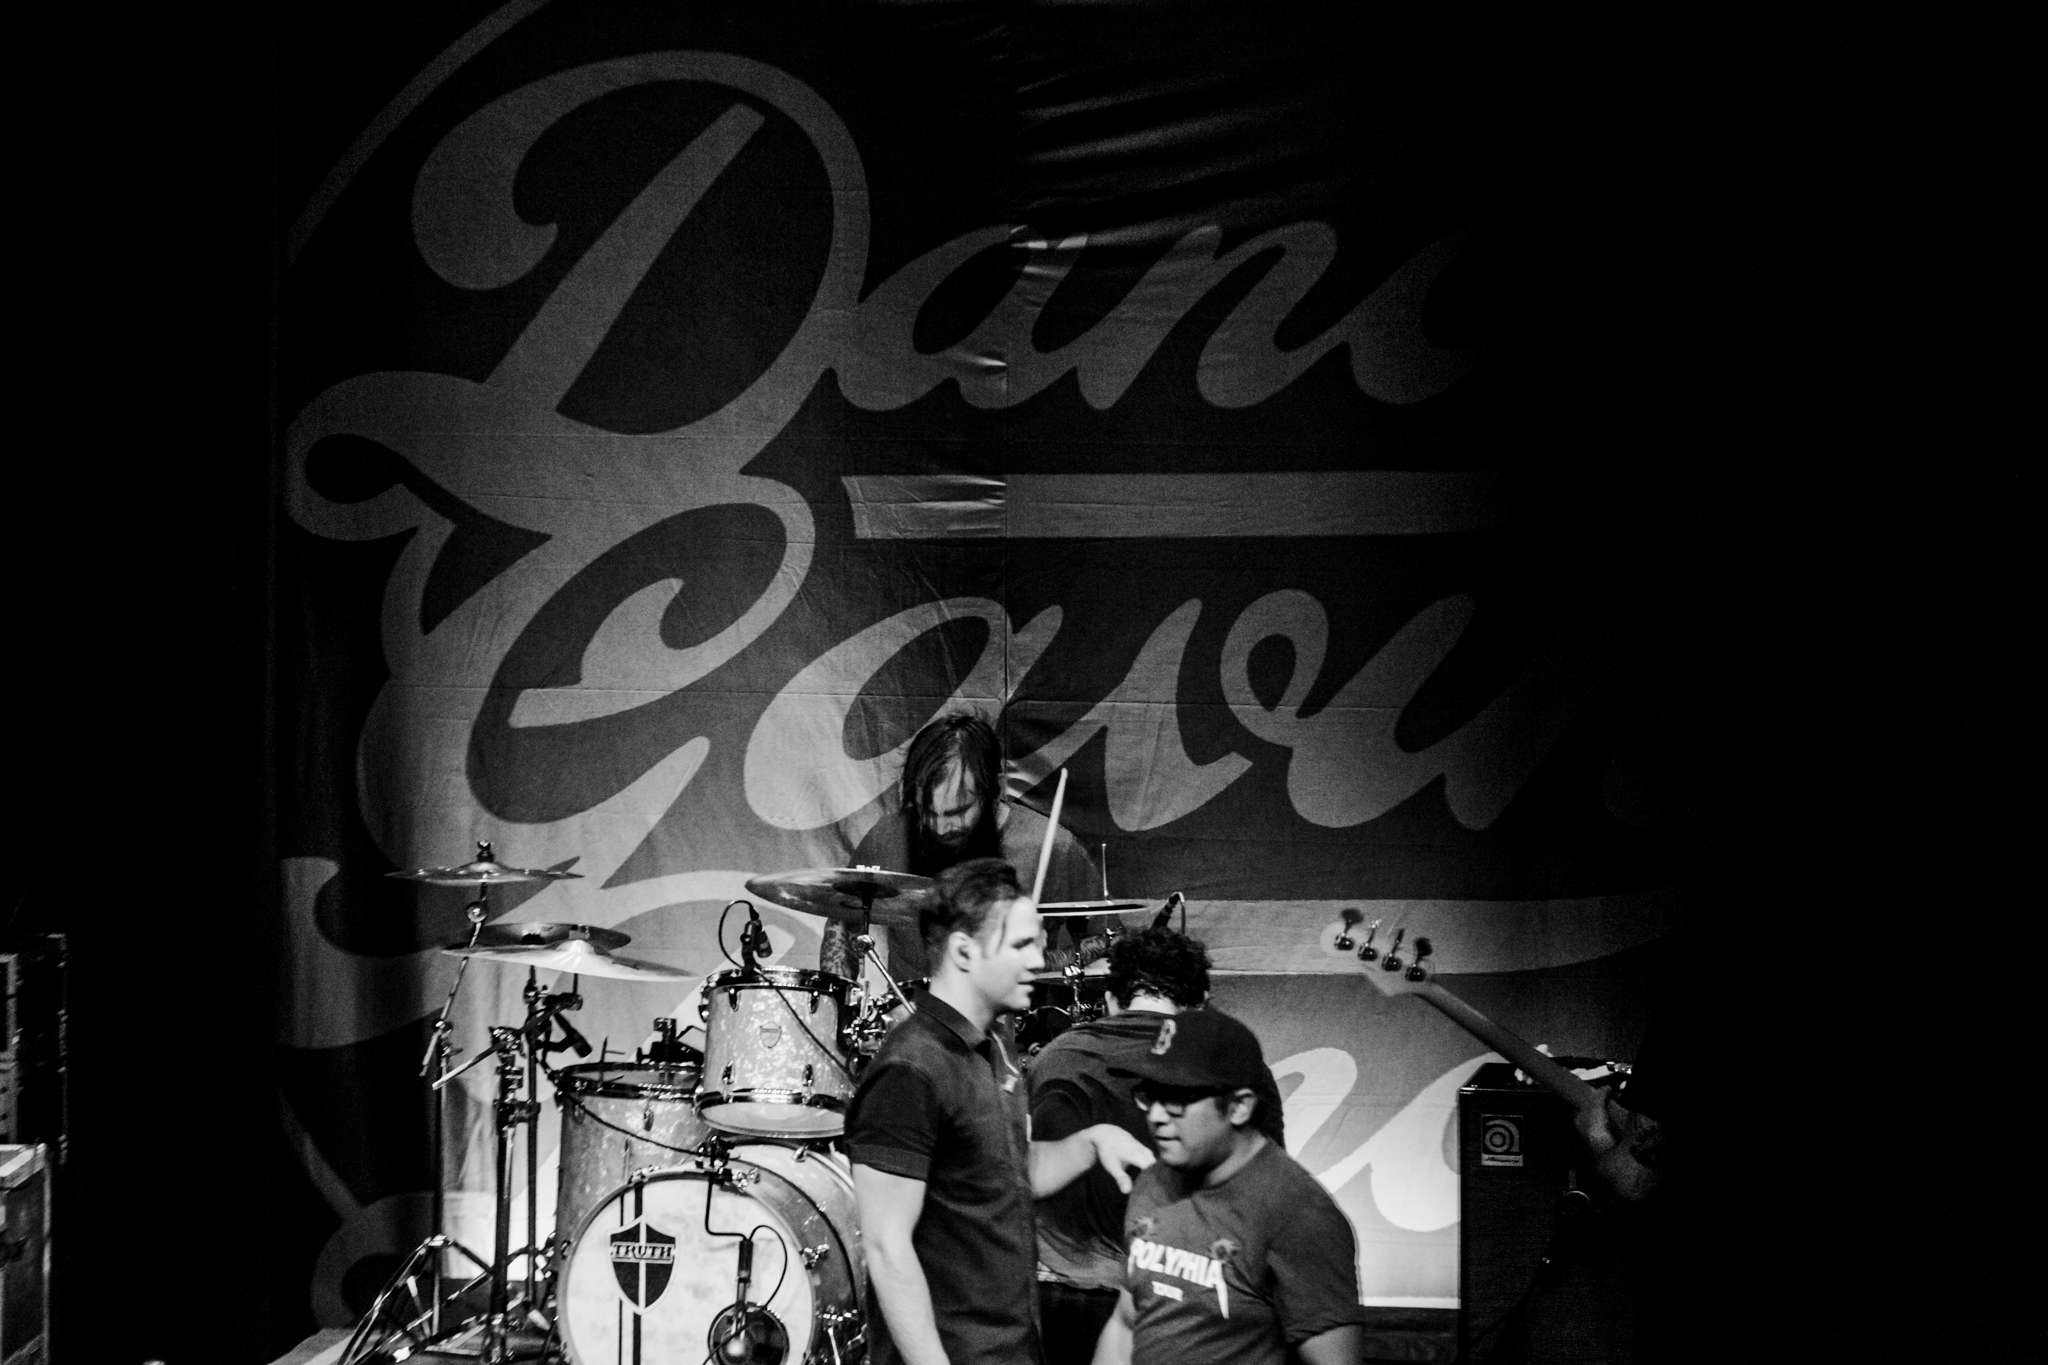 Lafferty Photo - Dance Gavin Dance 03.08.17-8898.jpg